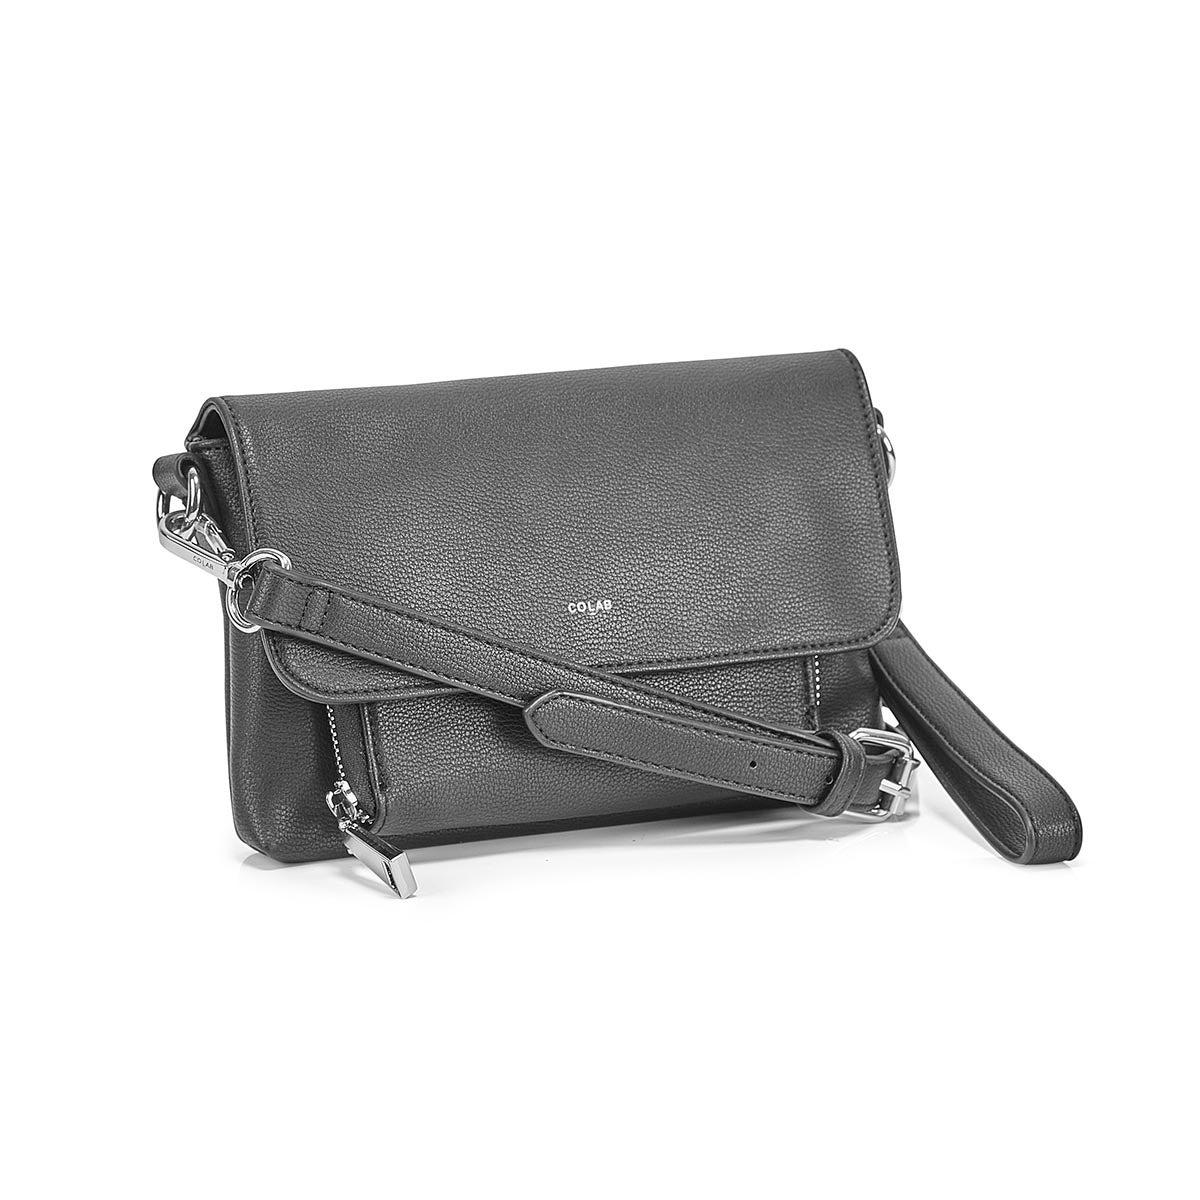 Women's 6492 fudge front flap crossbody bags